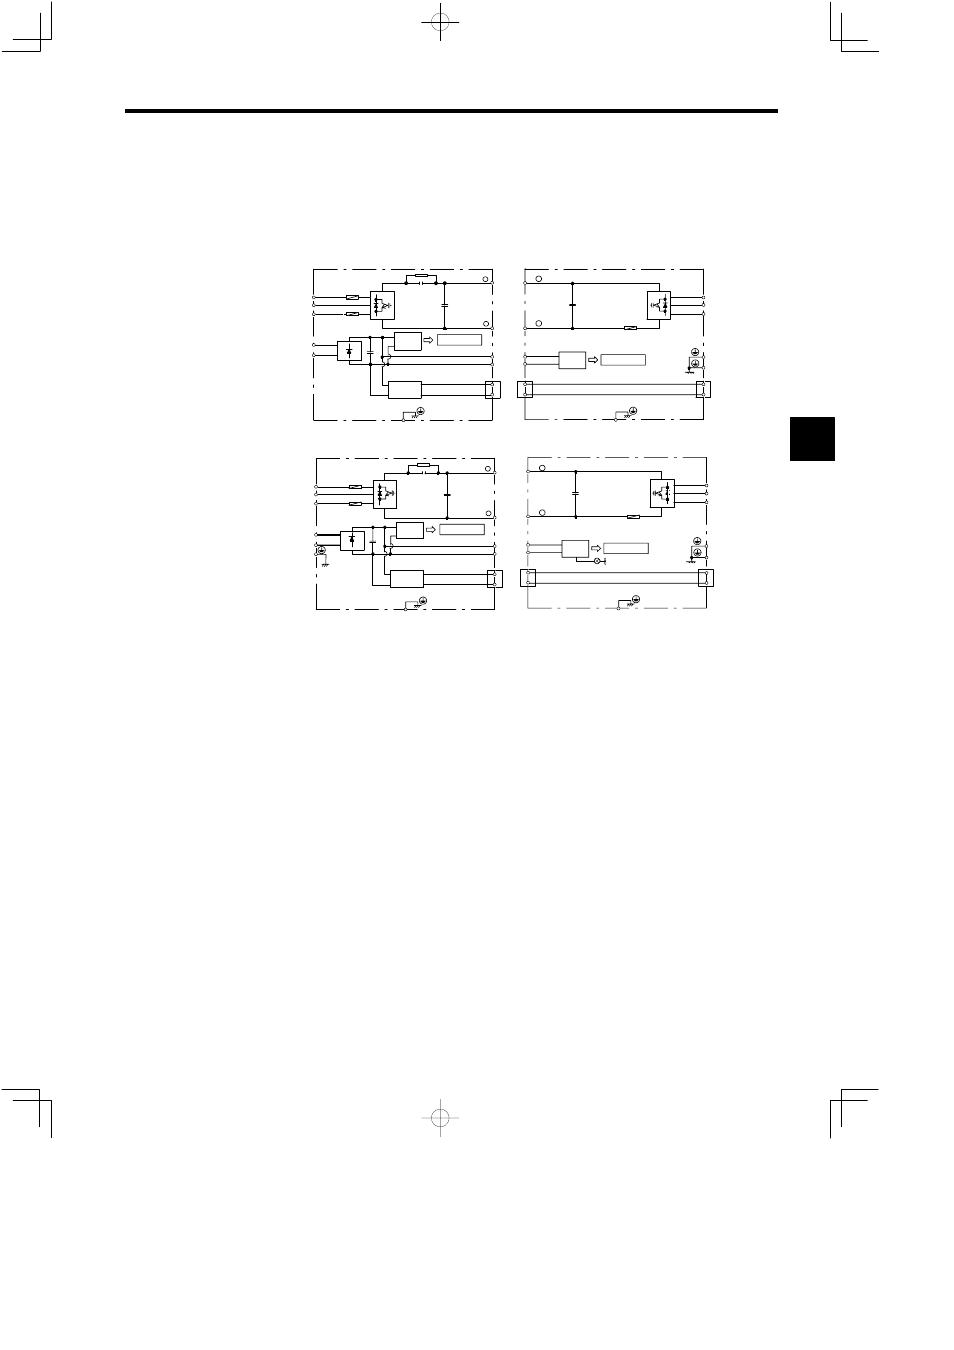 3 Main Circuit Configuration  200 V Class External